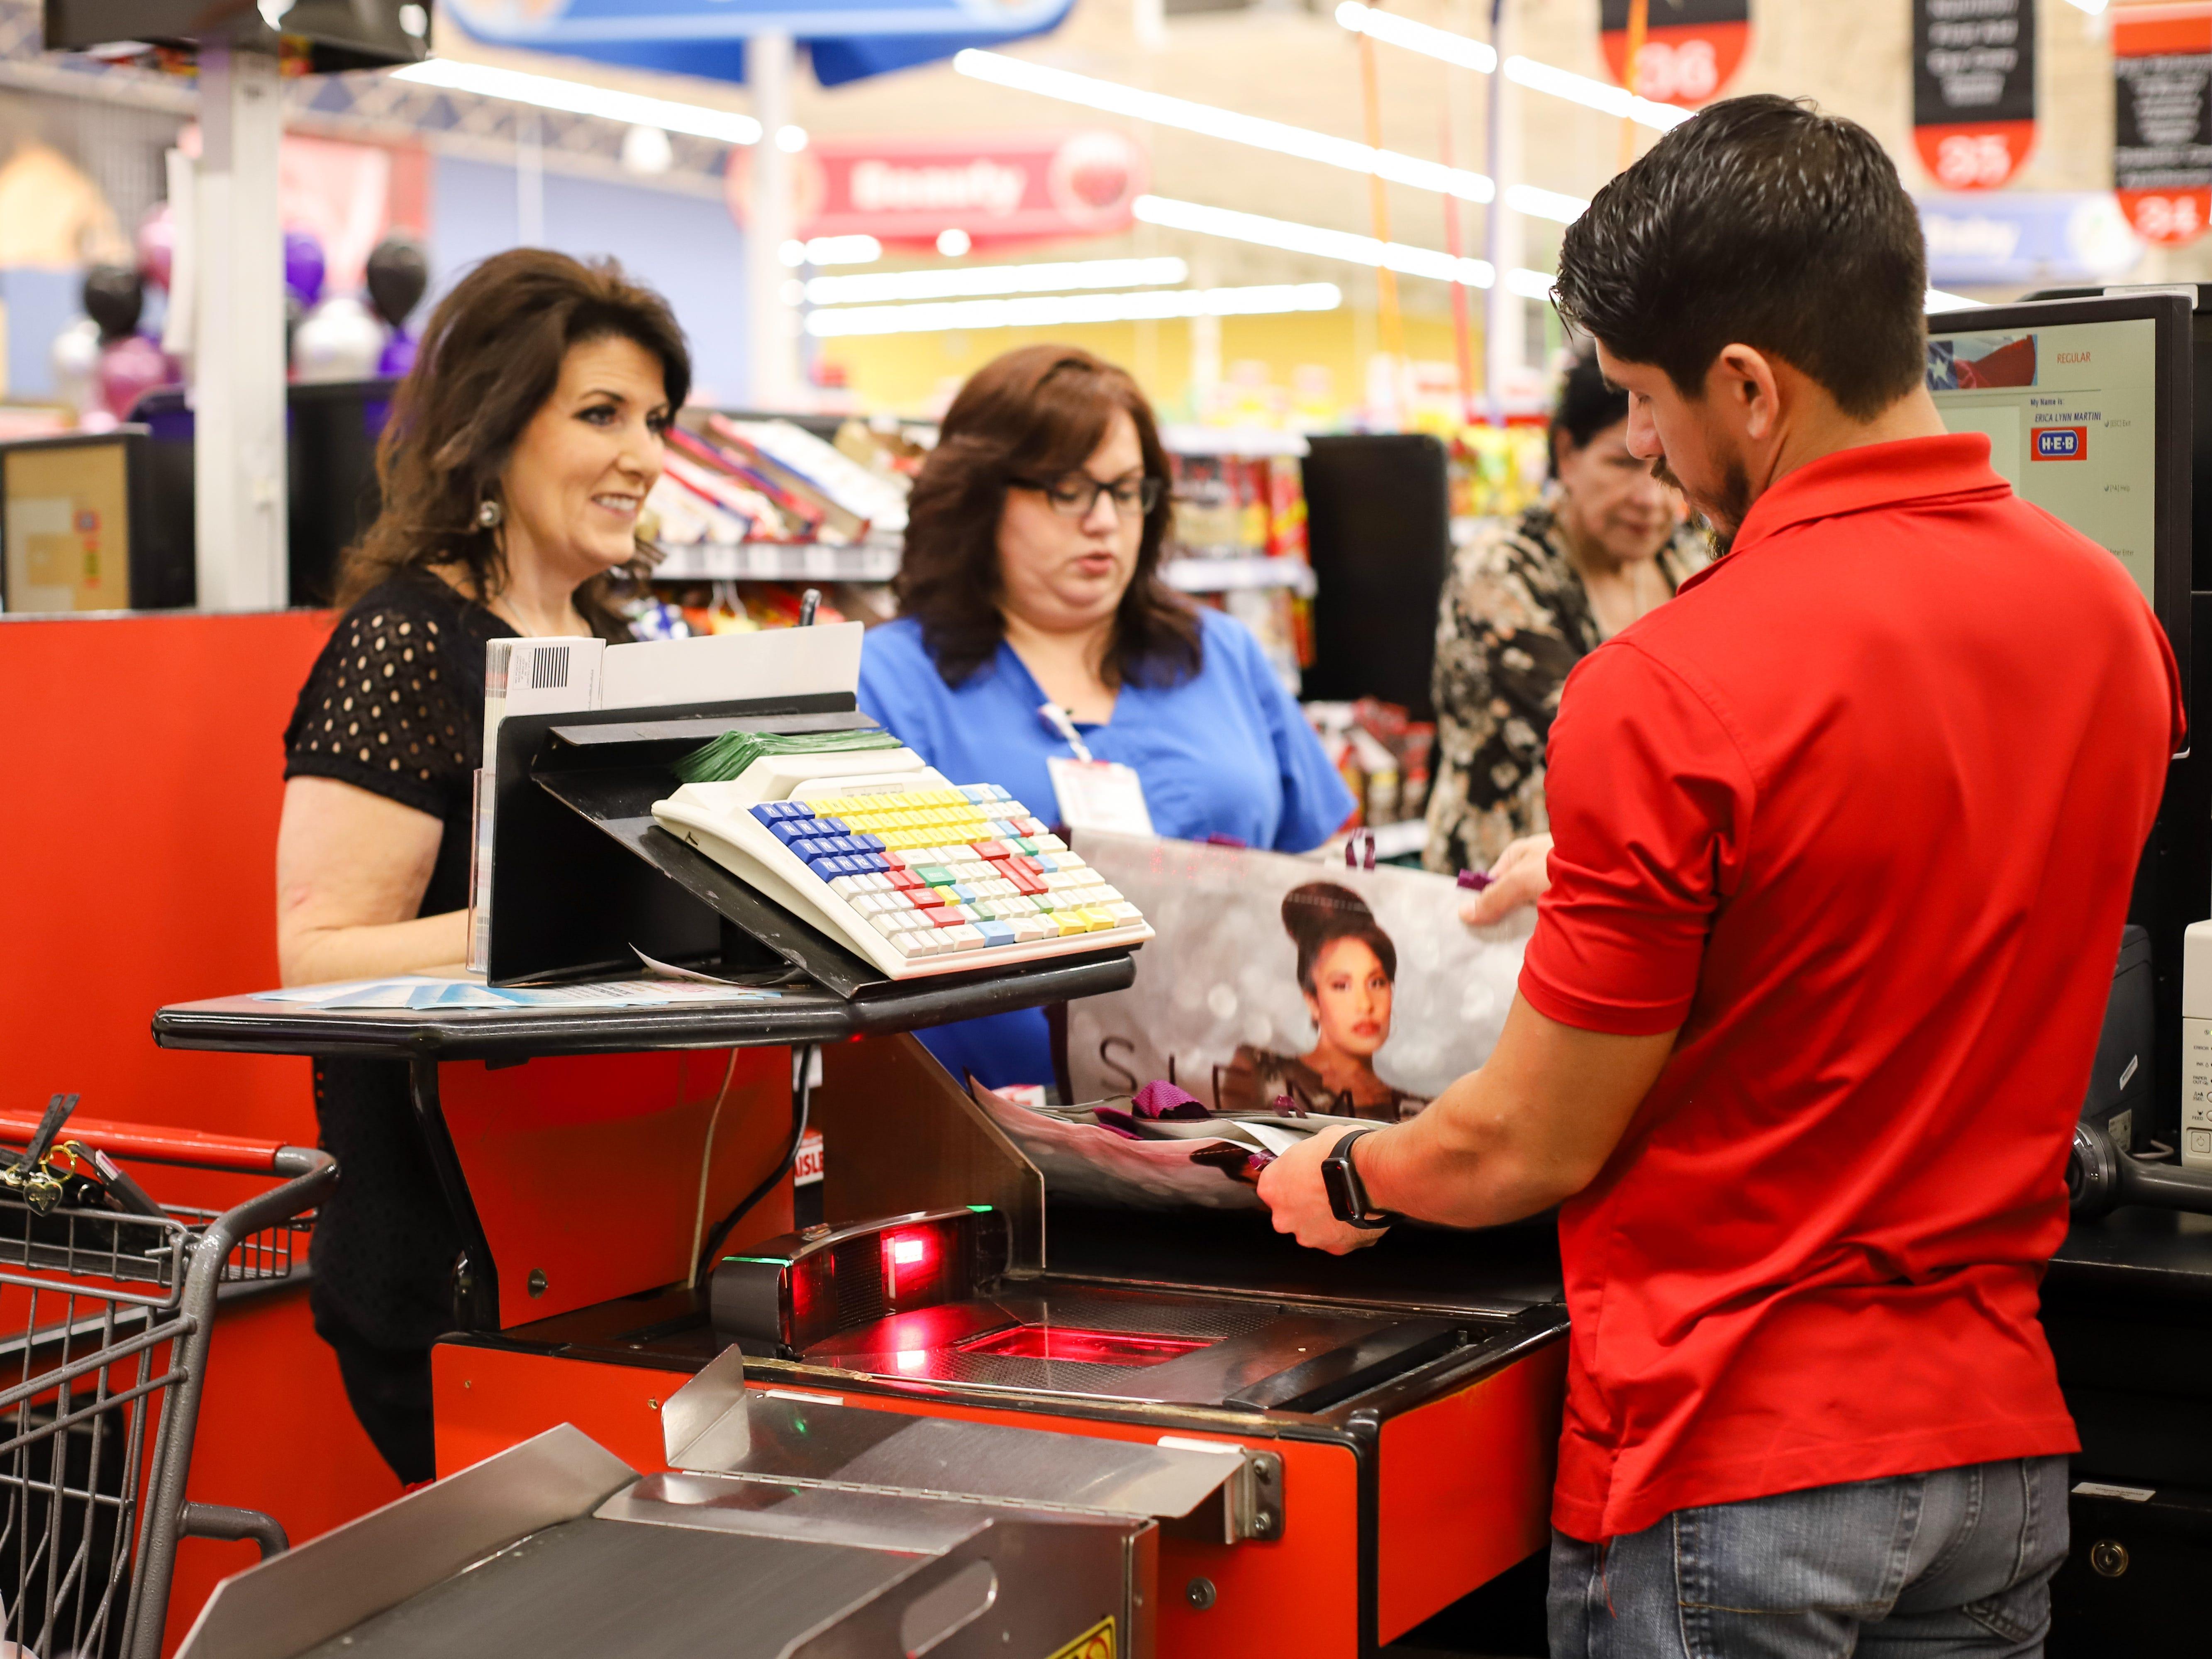 Customers purchase Selena reusable bags at the H-E-B Plus on Saratoga Boulevard in Corpus Christi on Dec. 6, 2018.